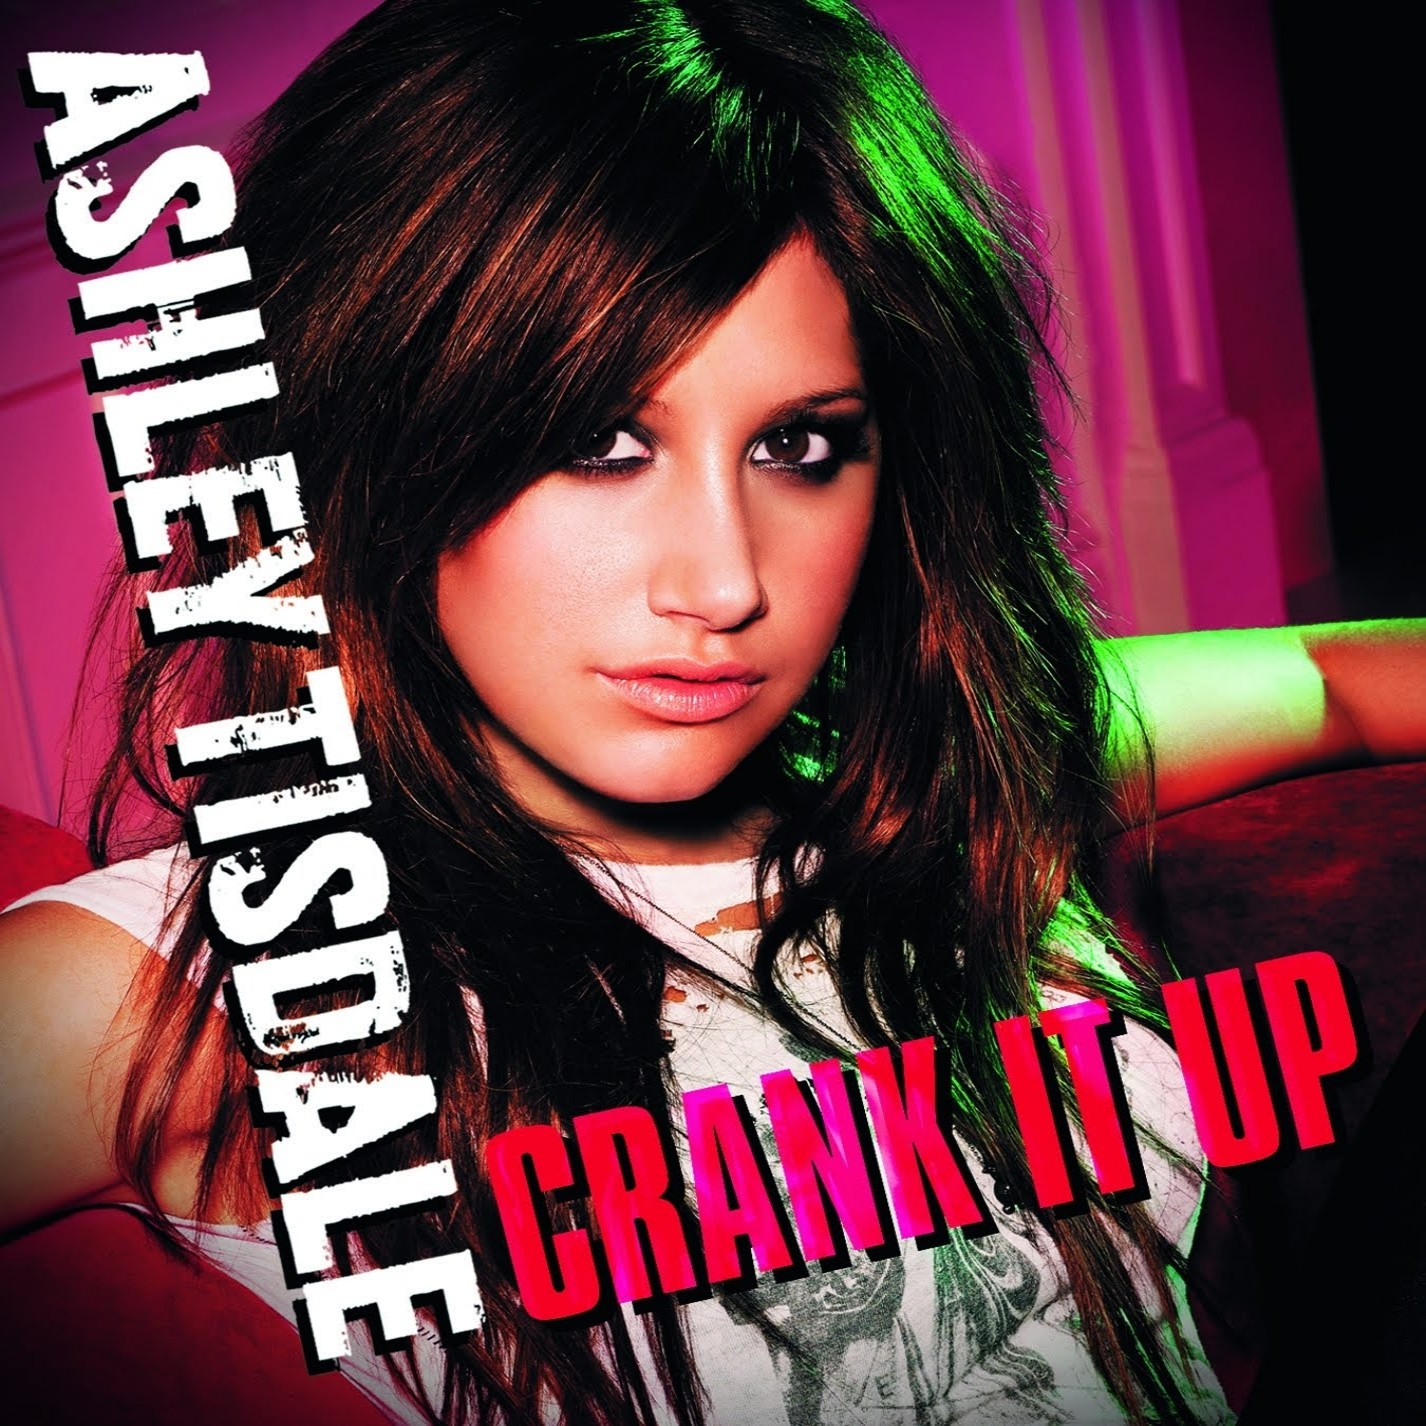 http://2.bp.blogspot.com/_bI5-8YnkkFA/TBd1ef4T-PI/AAAAAAAAD5U/pQozCW6lHjg/s1600/00-ashley_tisdale-crank_it_up--2009-front.jpg